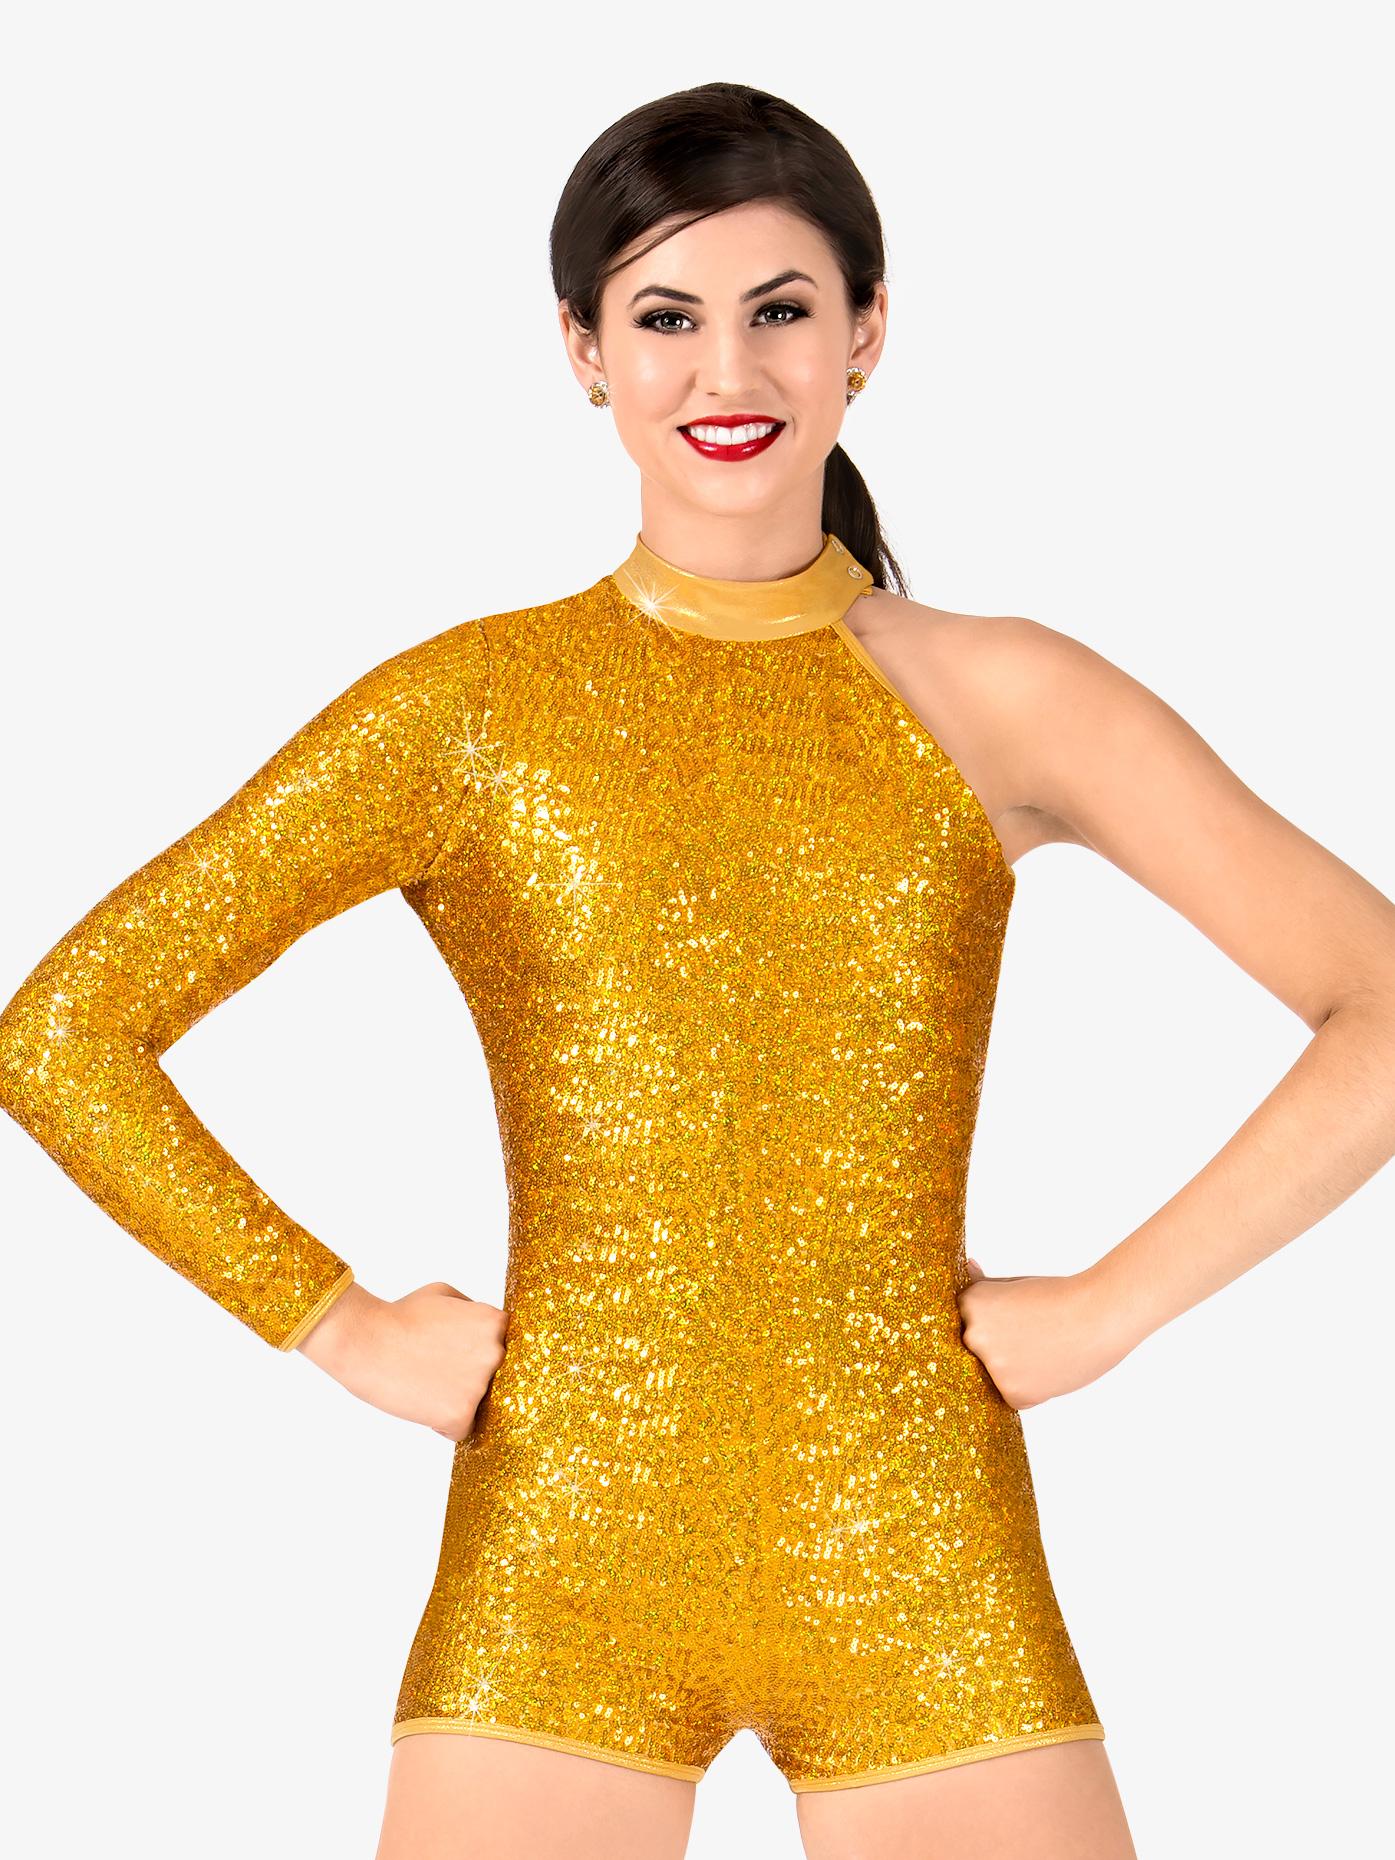 Double Platinum Womens Sequin Asymmetrical Performance Shorty Unitard N7388